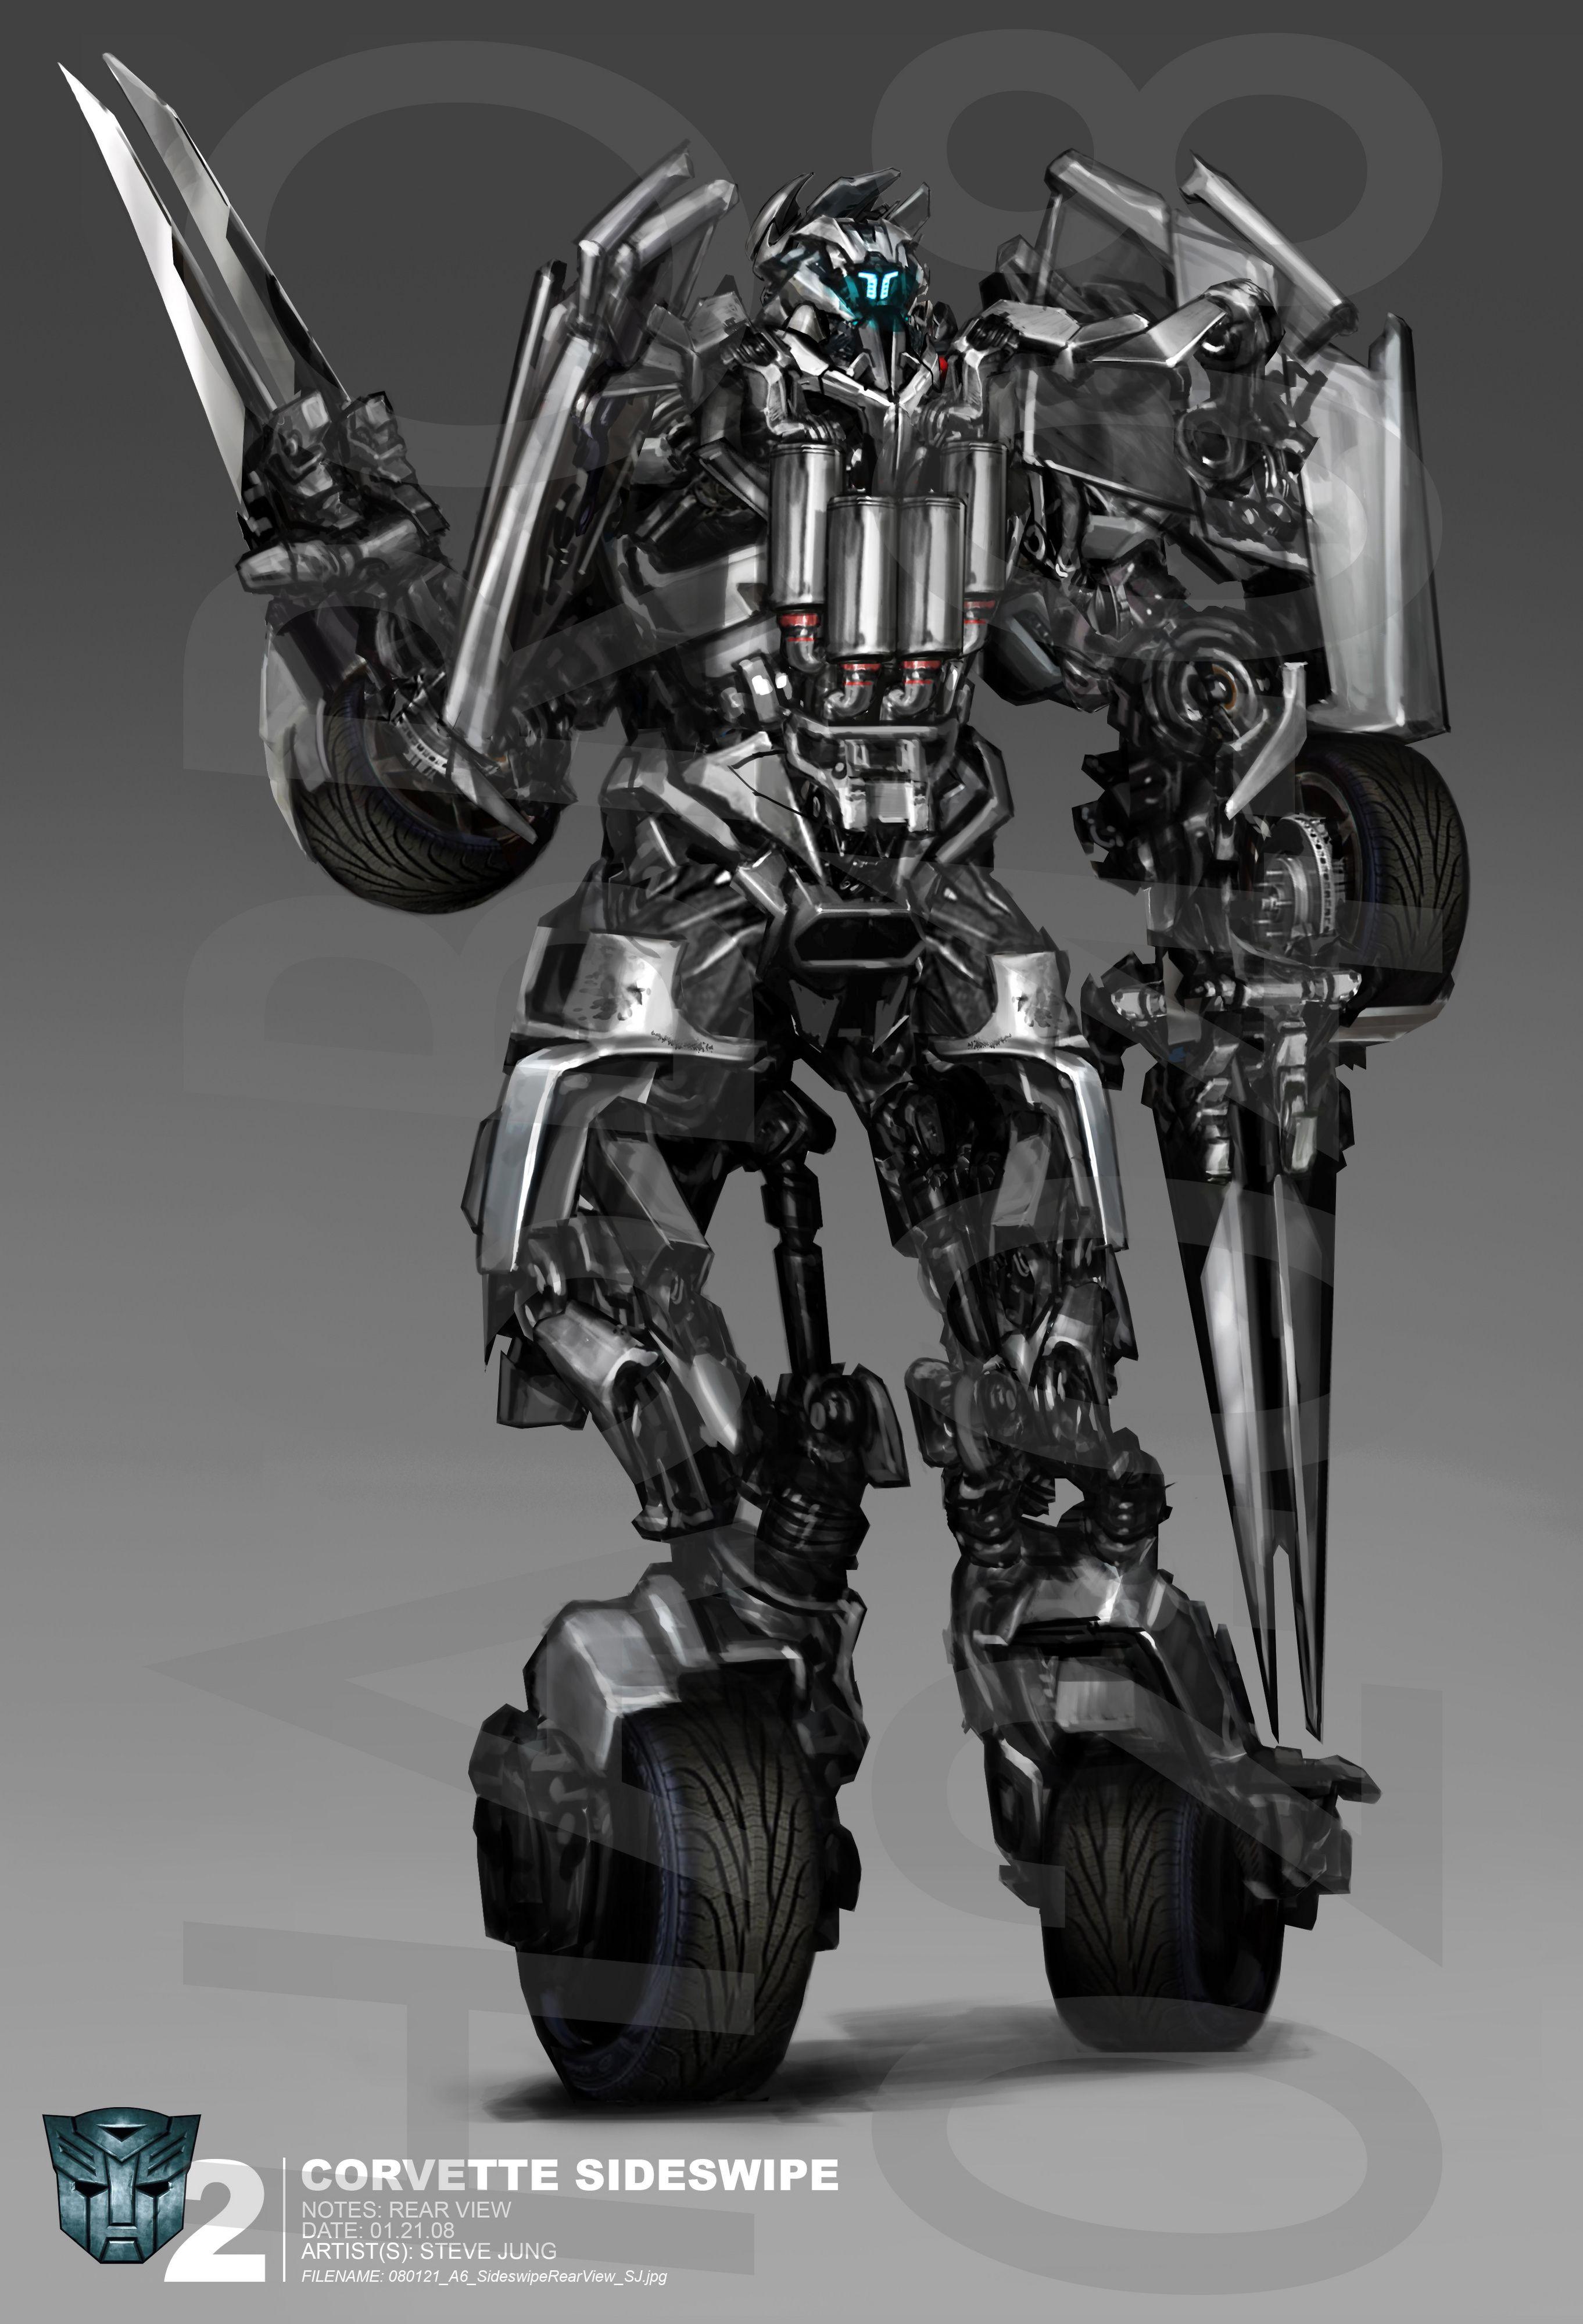 parte posterior de sideswipe autobots transformers